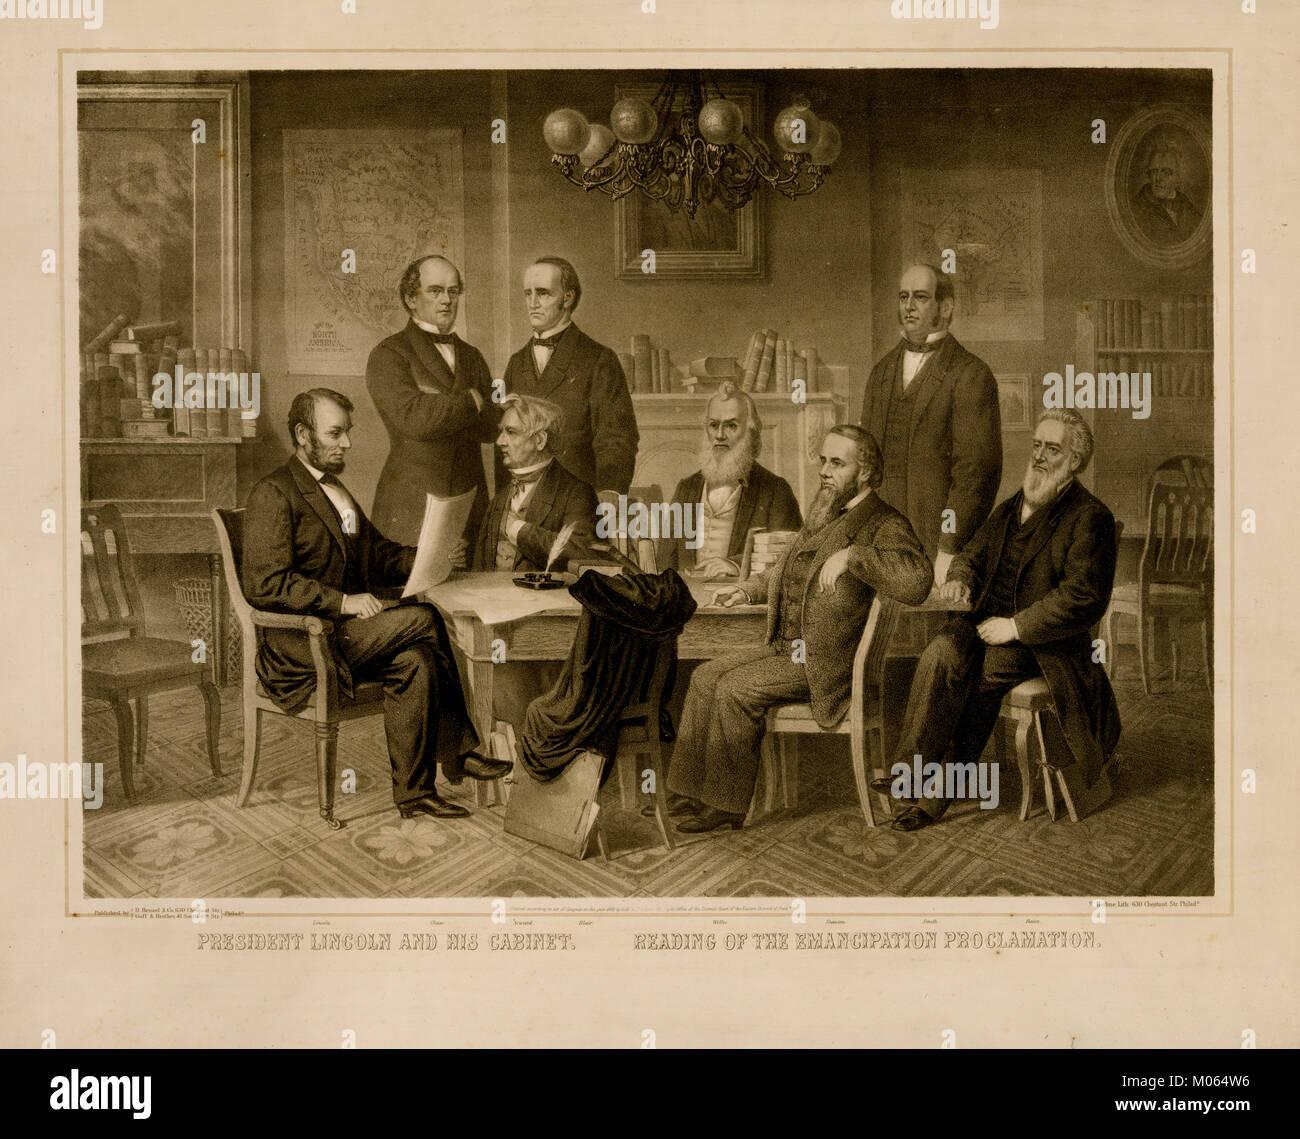 president lincoln emancipation proclamation Stock Photos & president ...